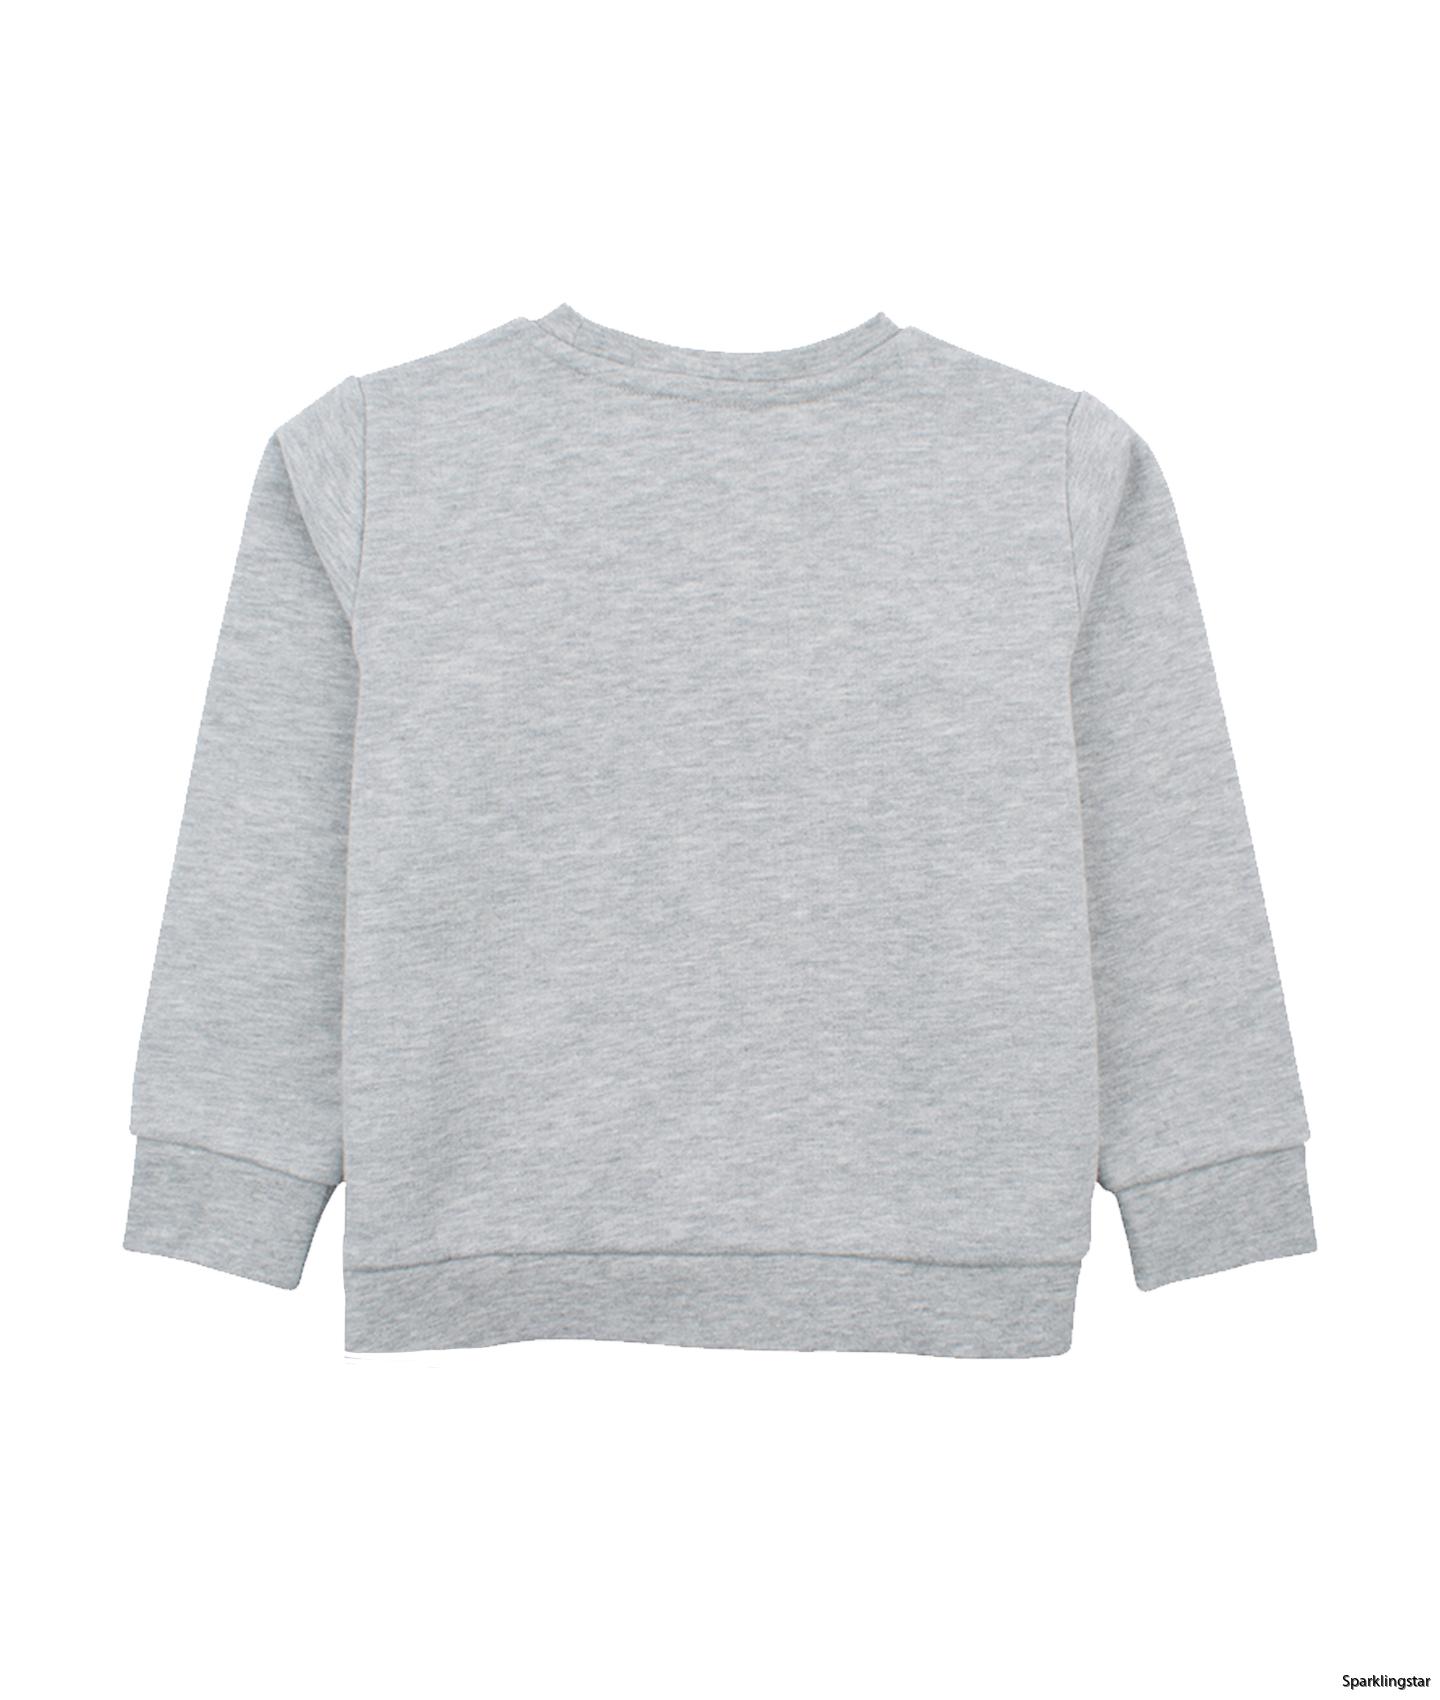 Livly Sleeping Cutie Sweatshirt Grey